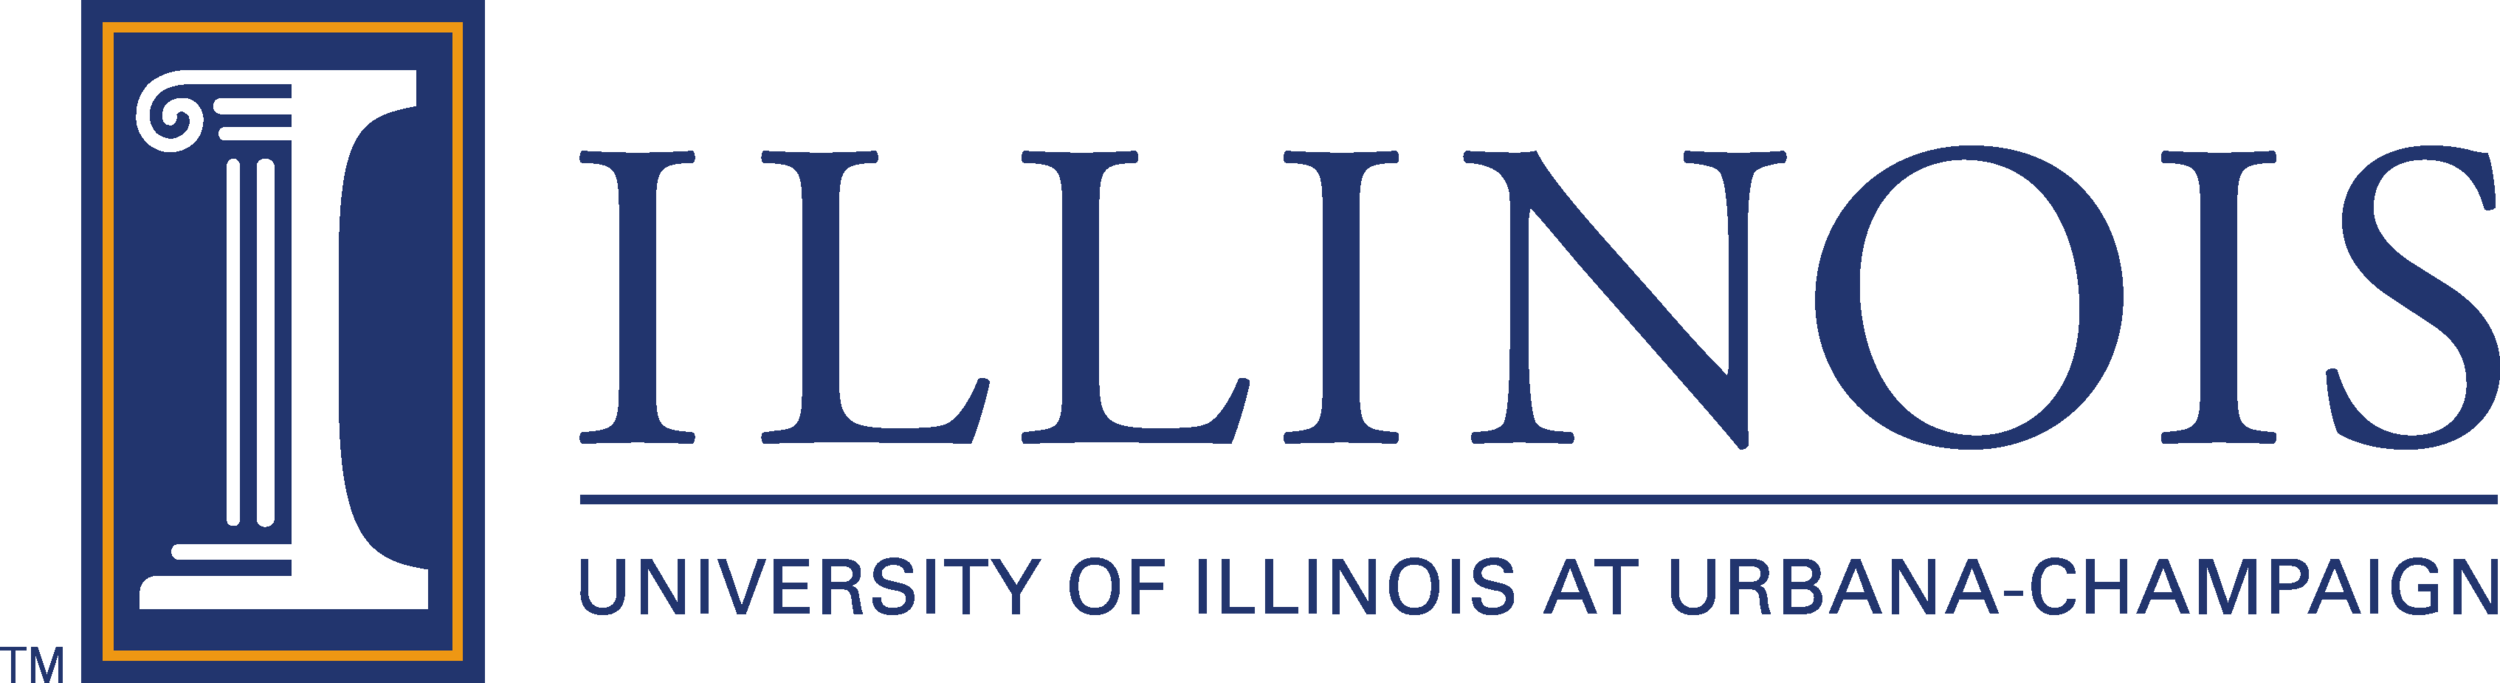 UIUC_Logo_University_of_Illinois_at_Urbana-Champaign.png